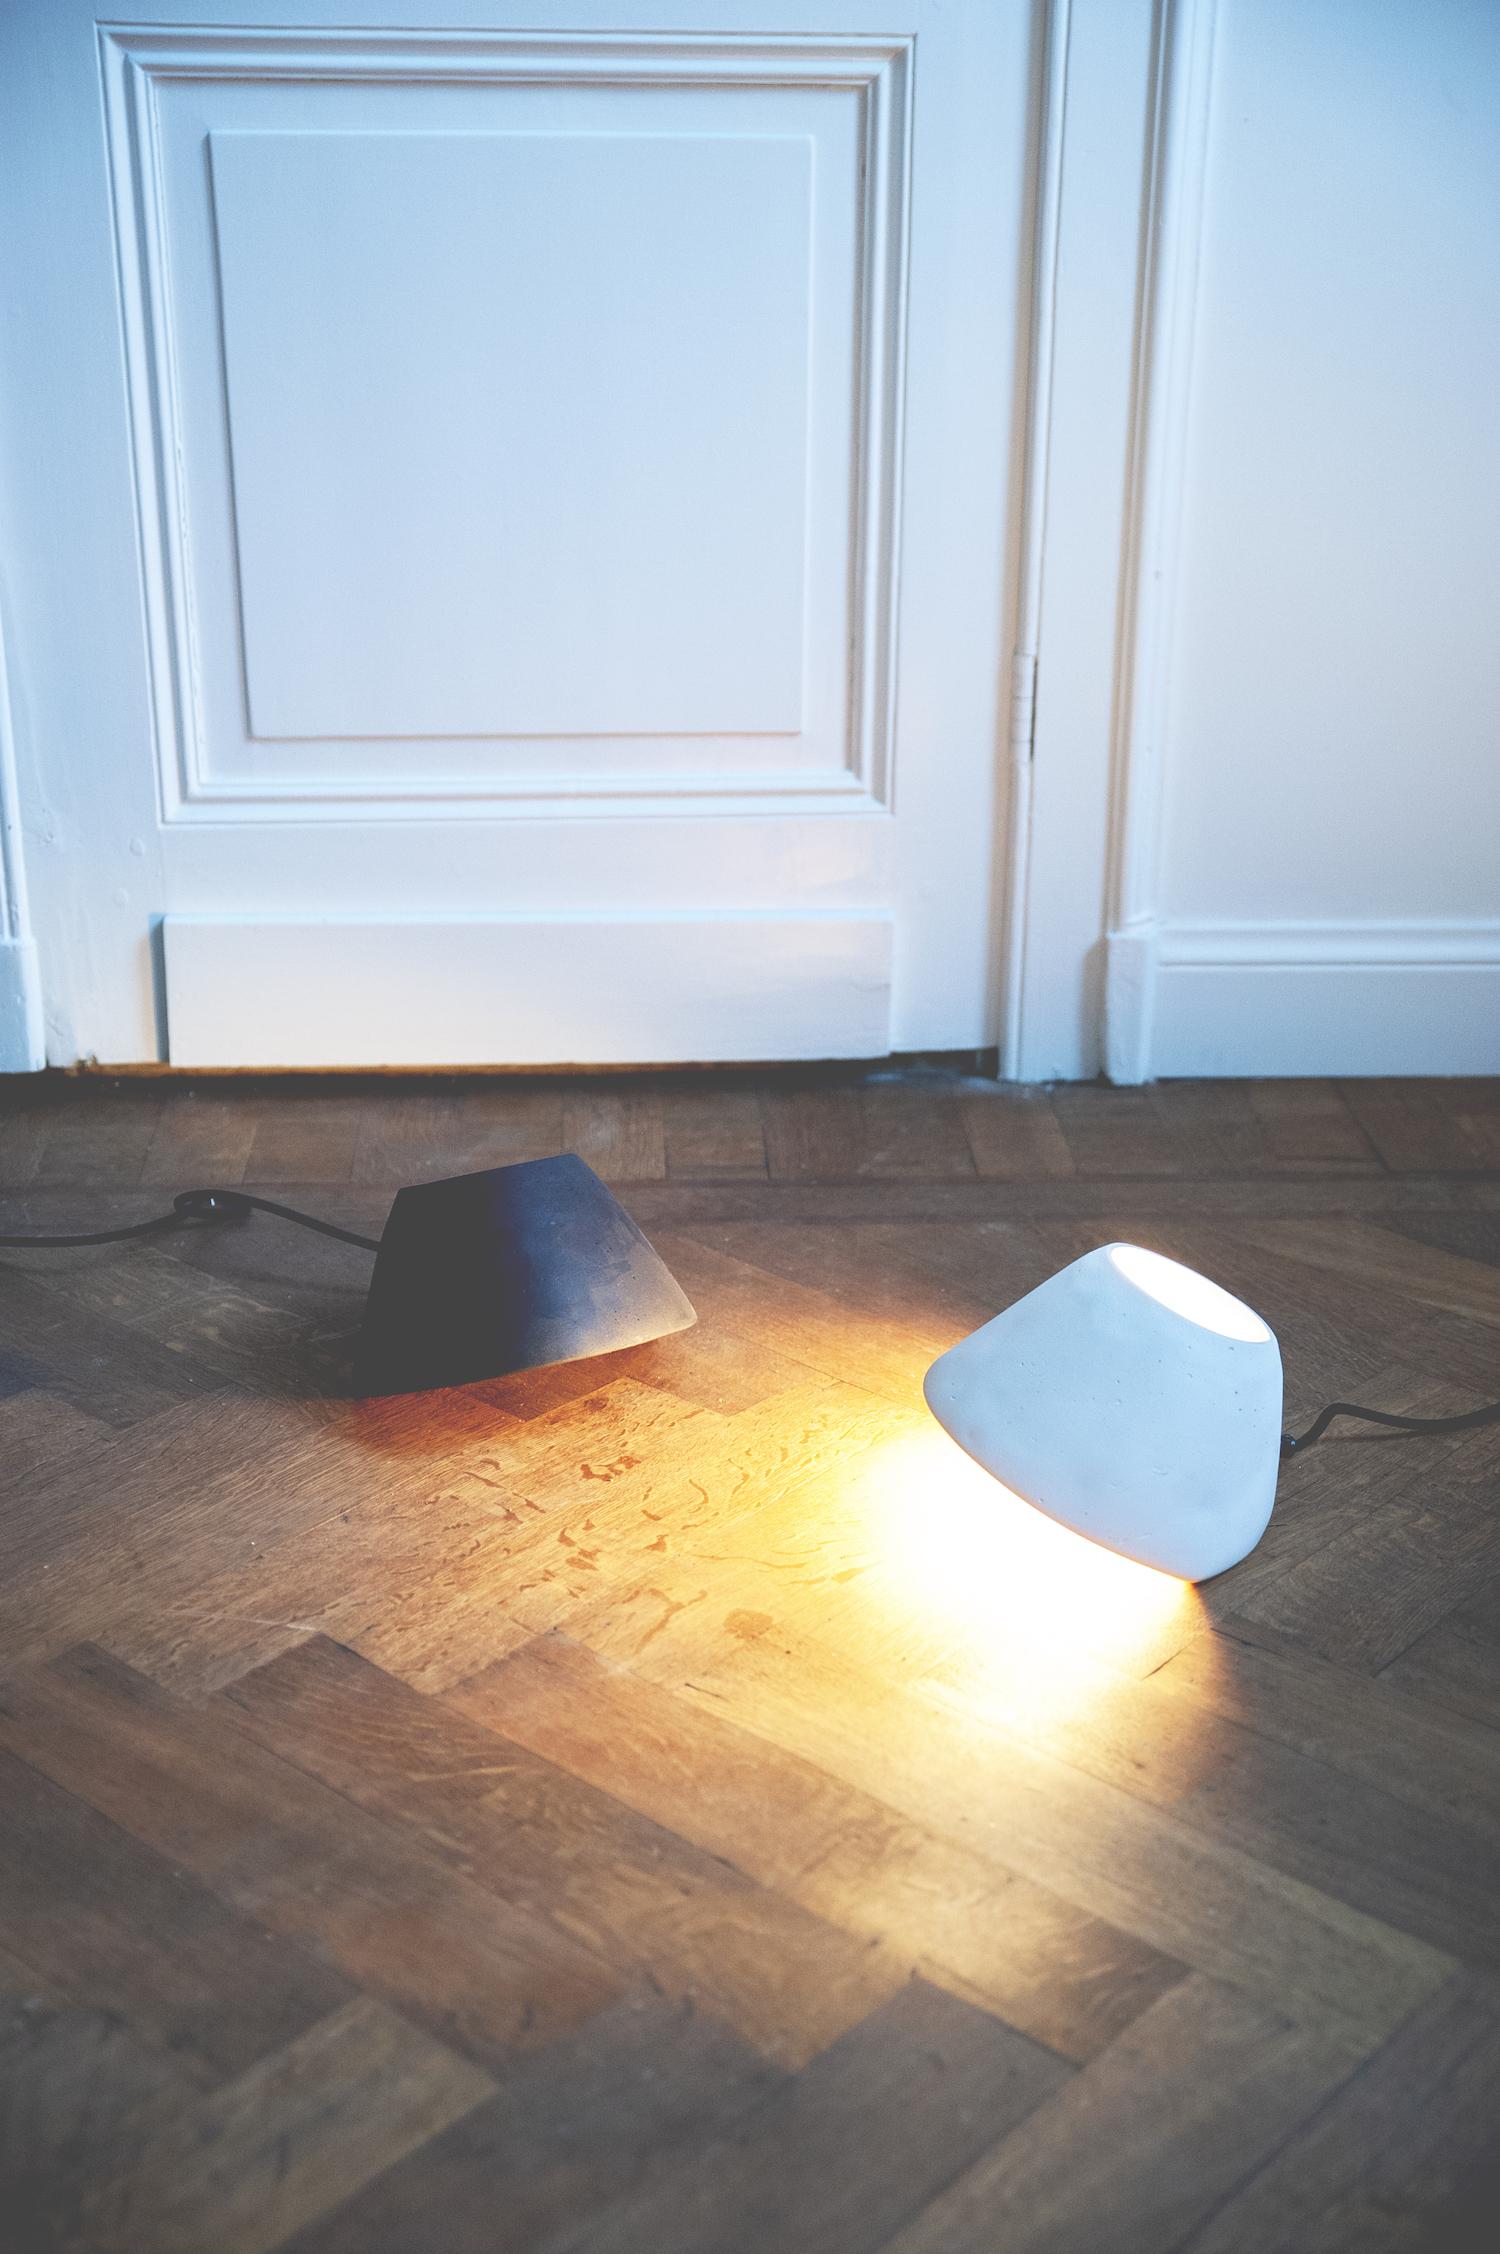 Eaunophe lamp Patrick Paris_8.jpg